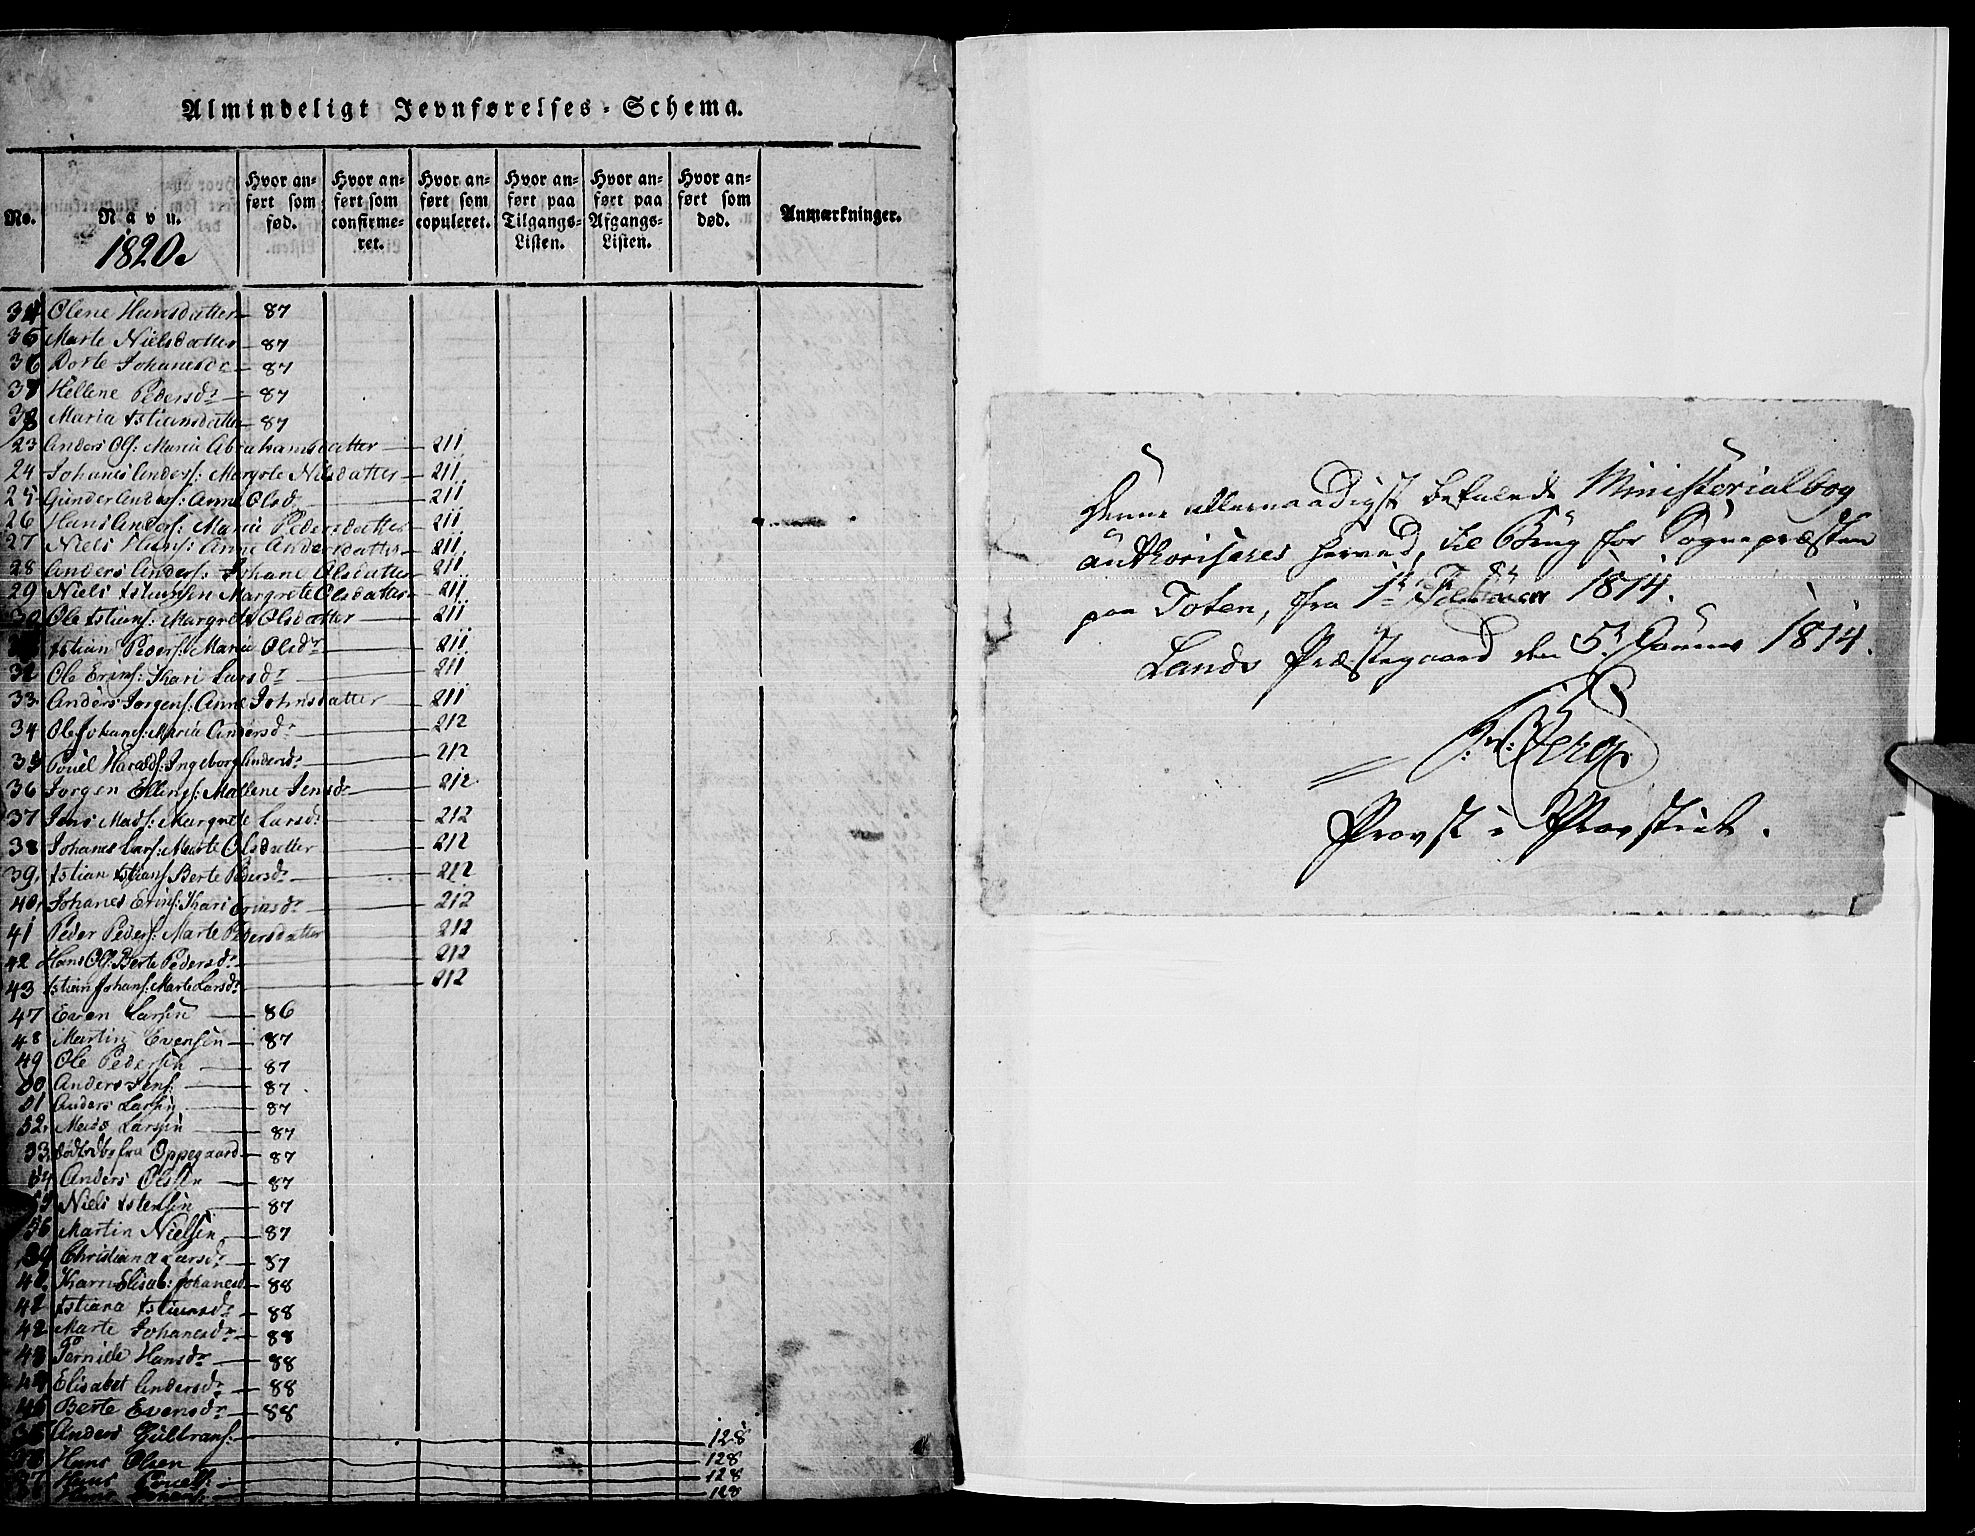 SAH, Toten prestekontor, Ministerialbok nr. 9, 1814-1820, s. 381